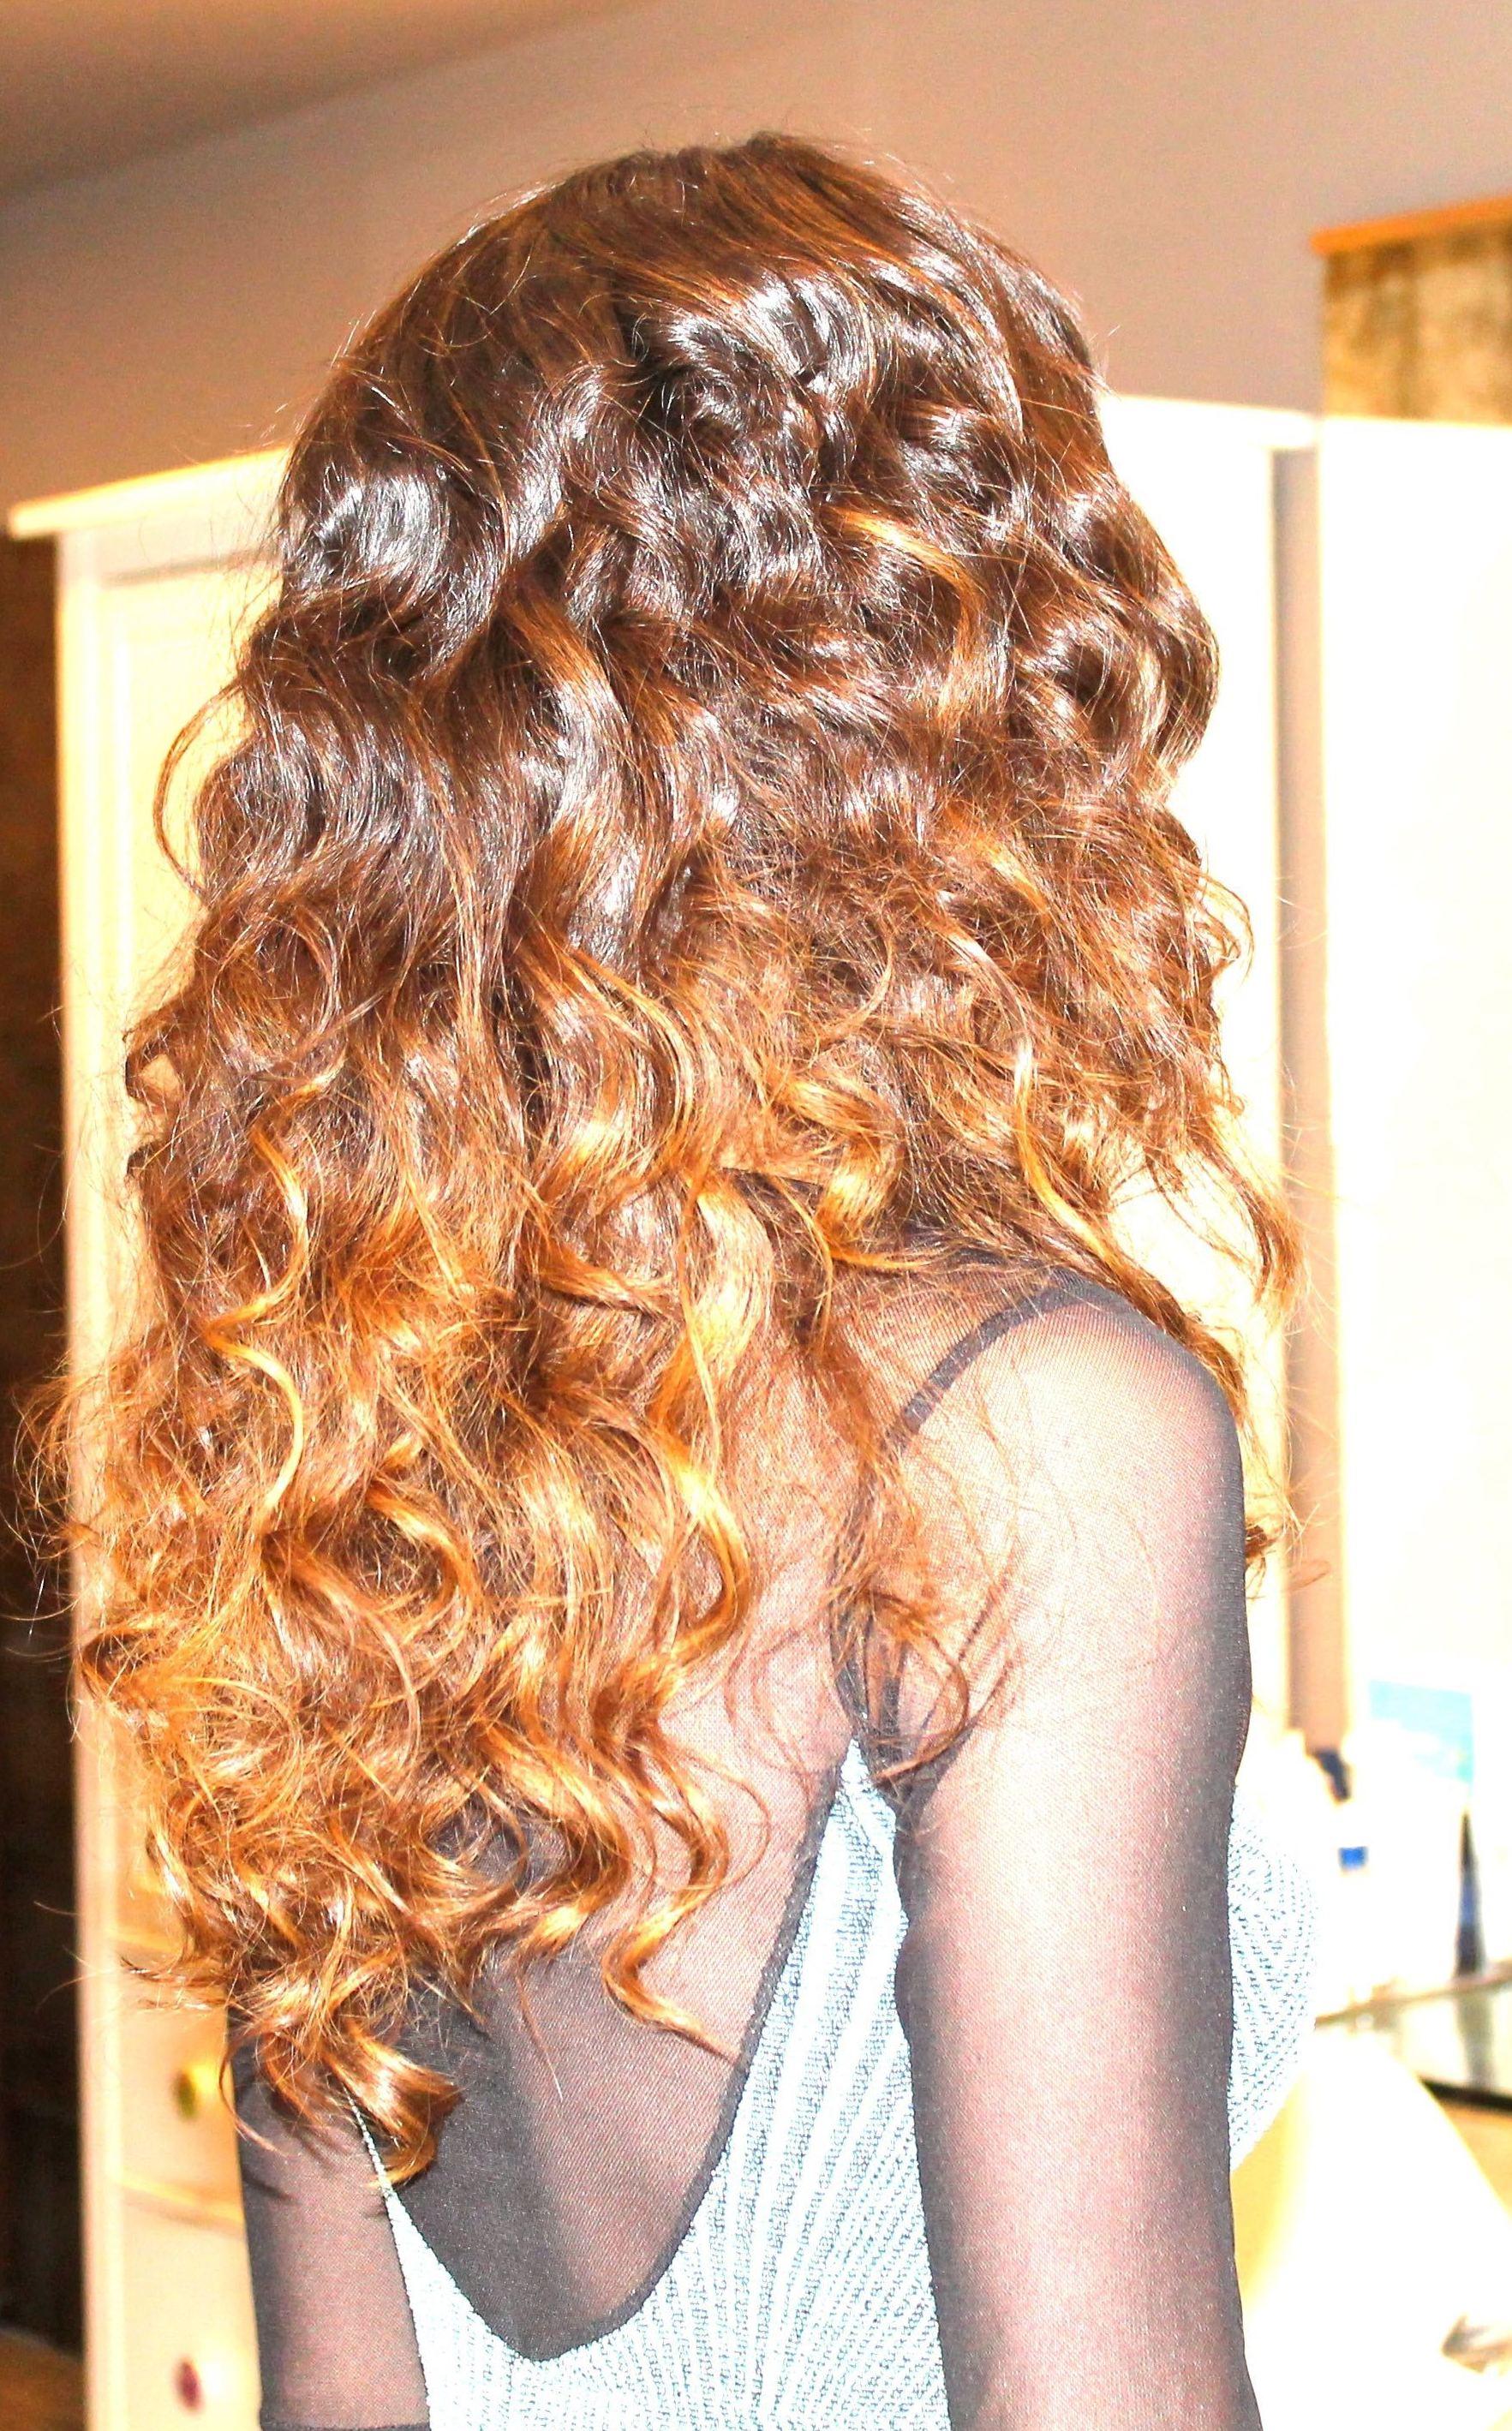 Peinados: Servicios de peluquería de Sonia Atanes